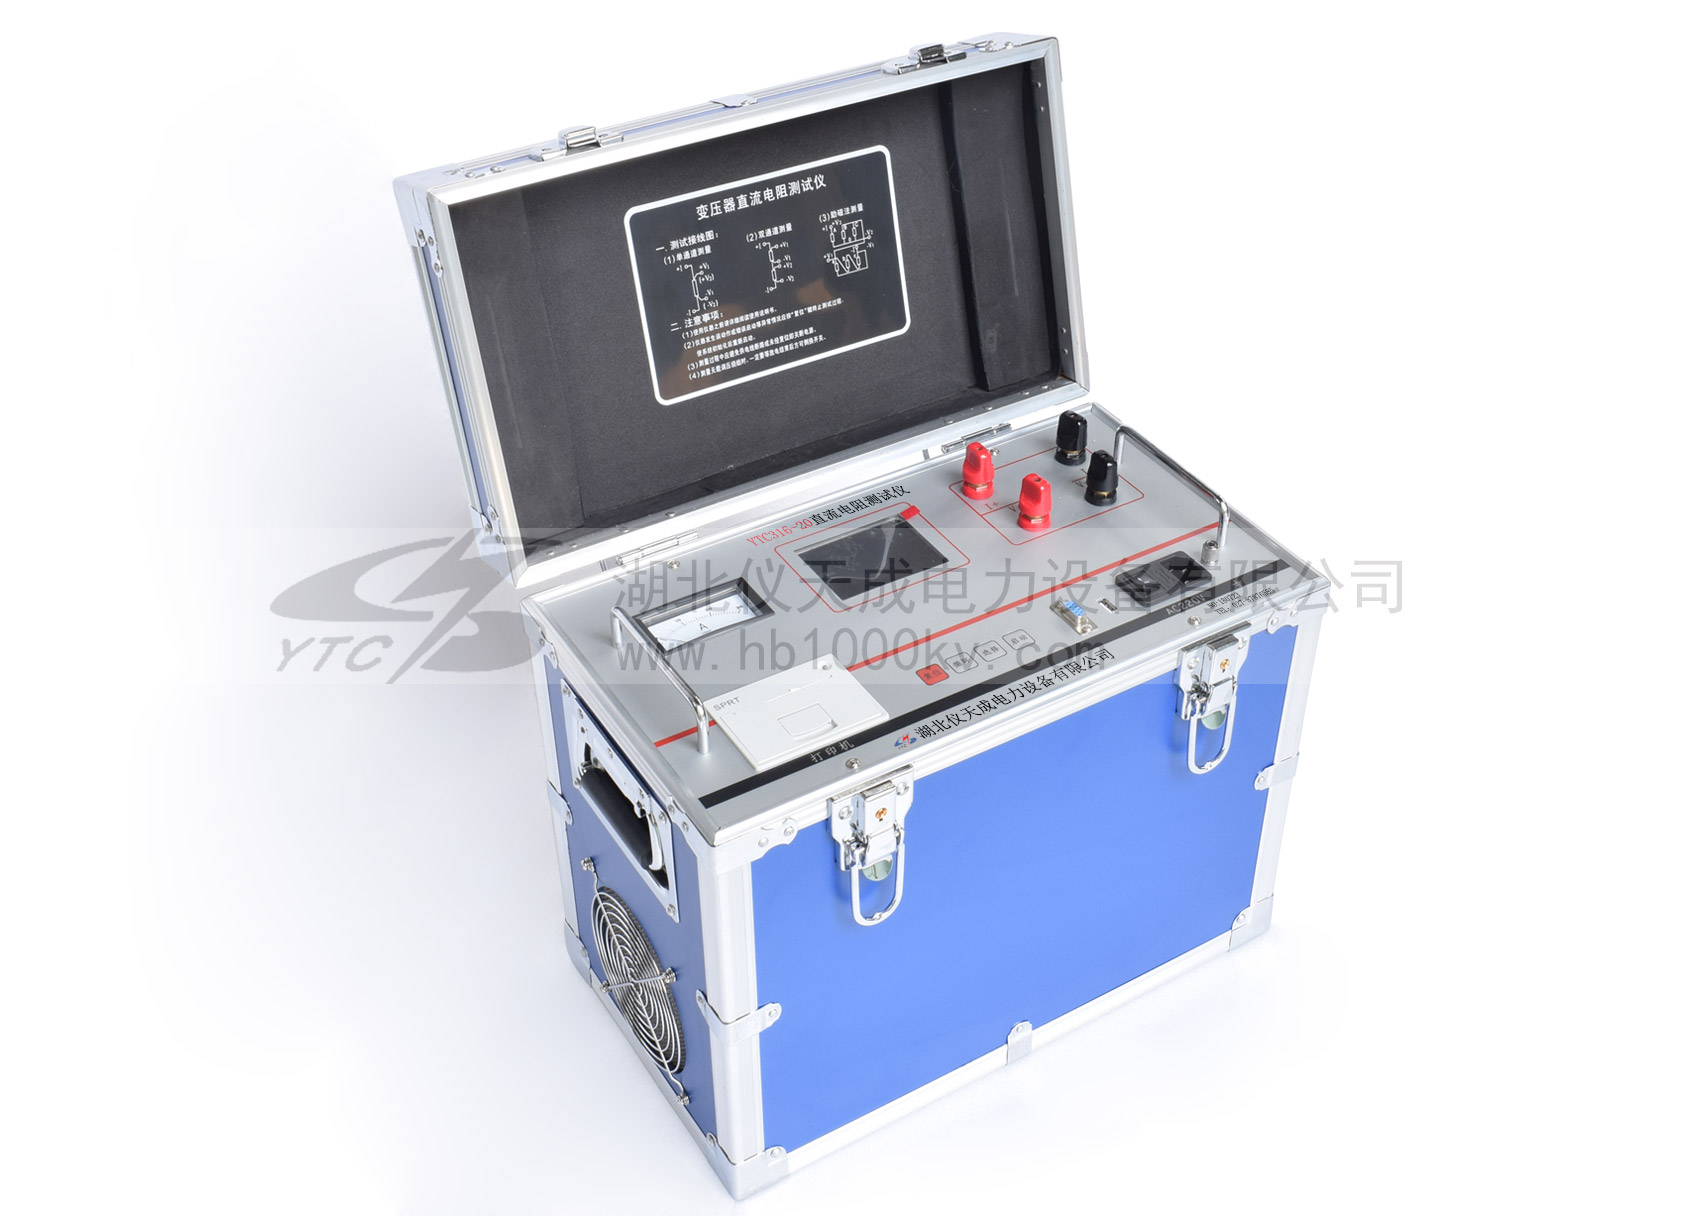 YTC316-20直流电阻测试仪主机